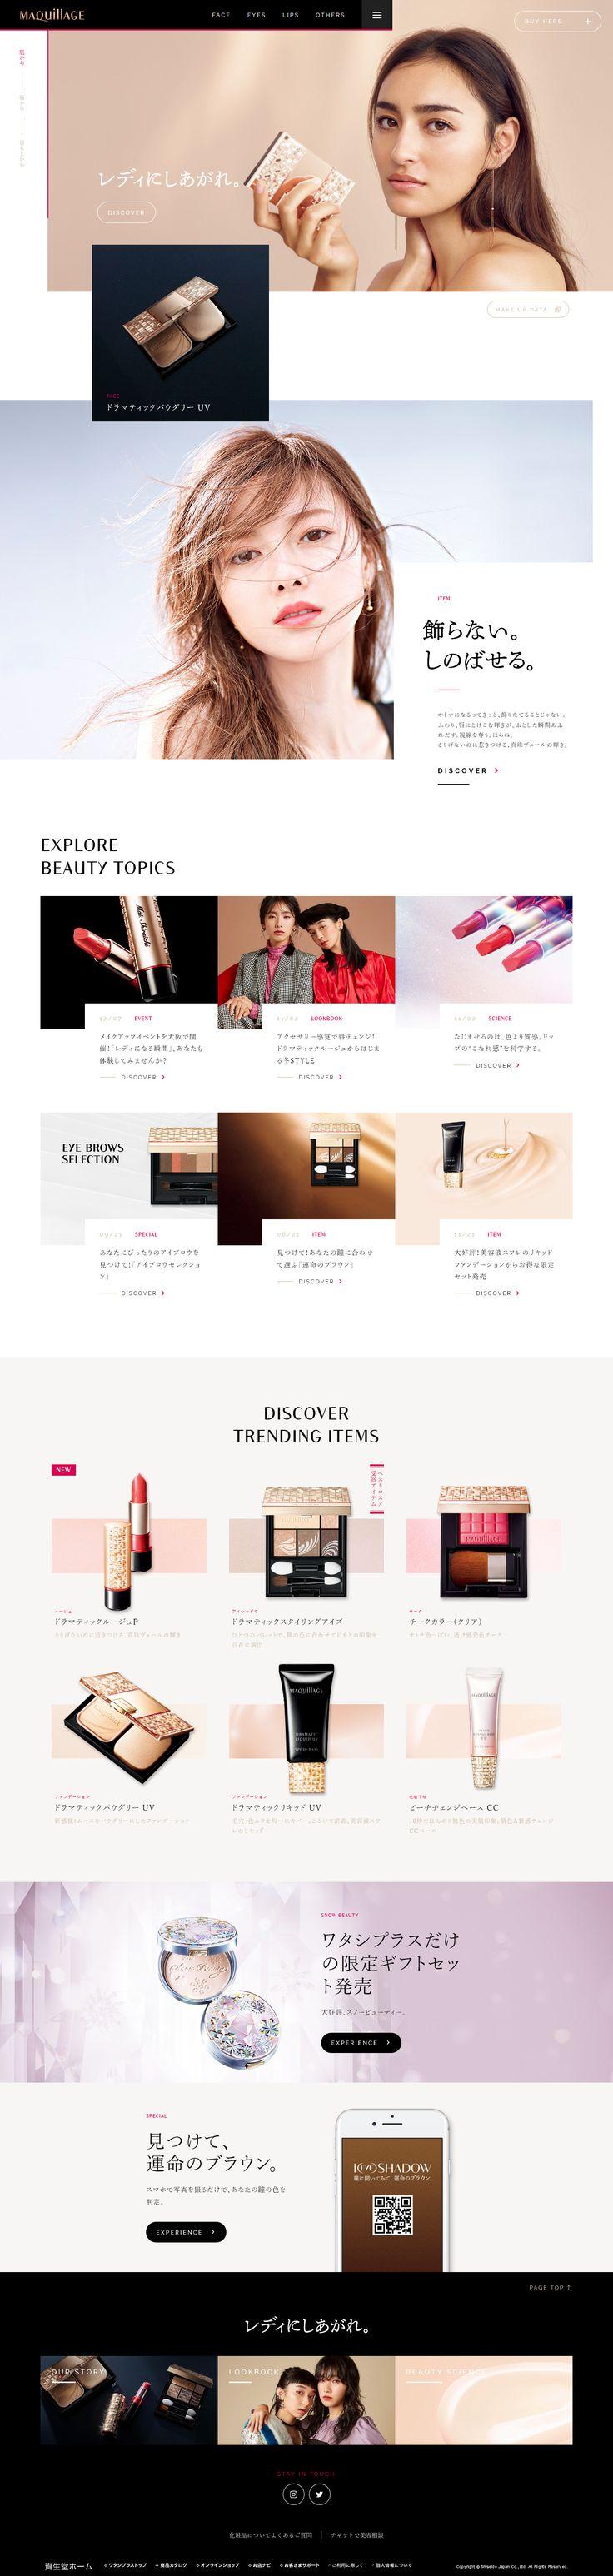 MAQuillAGE|資生堂 https://maquillage.shiseido.co.jp/